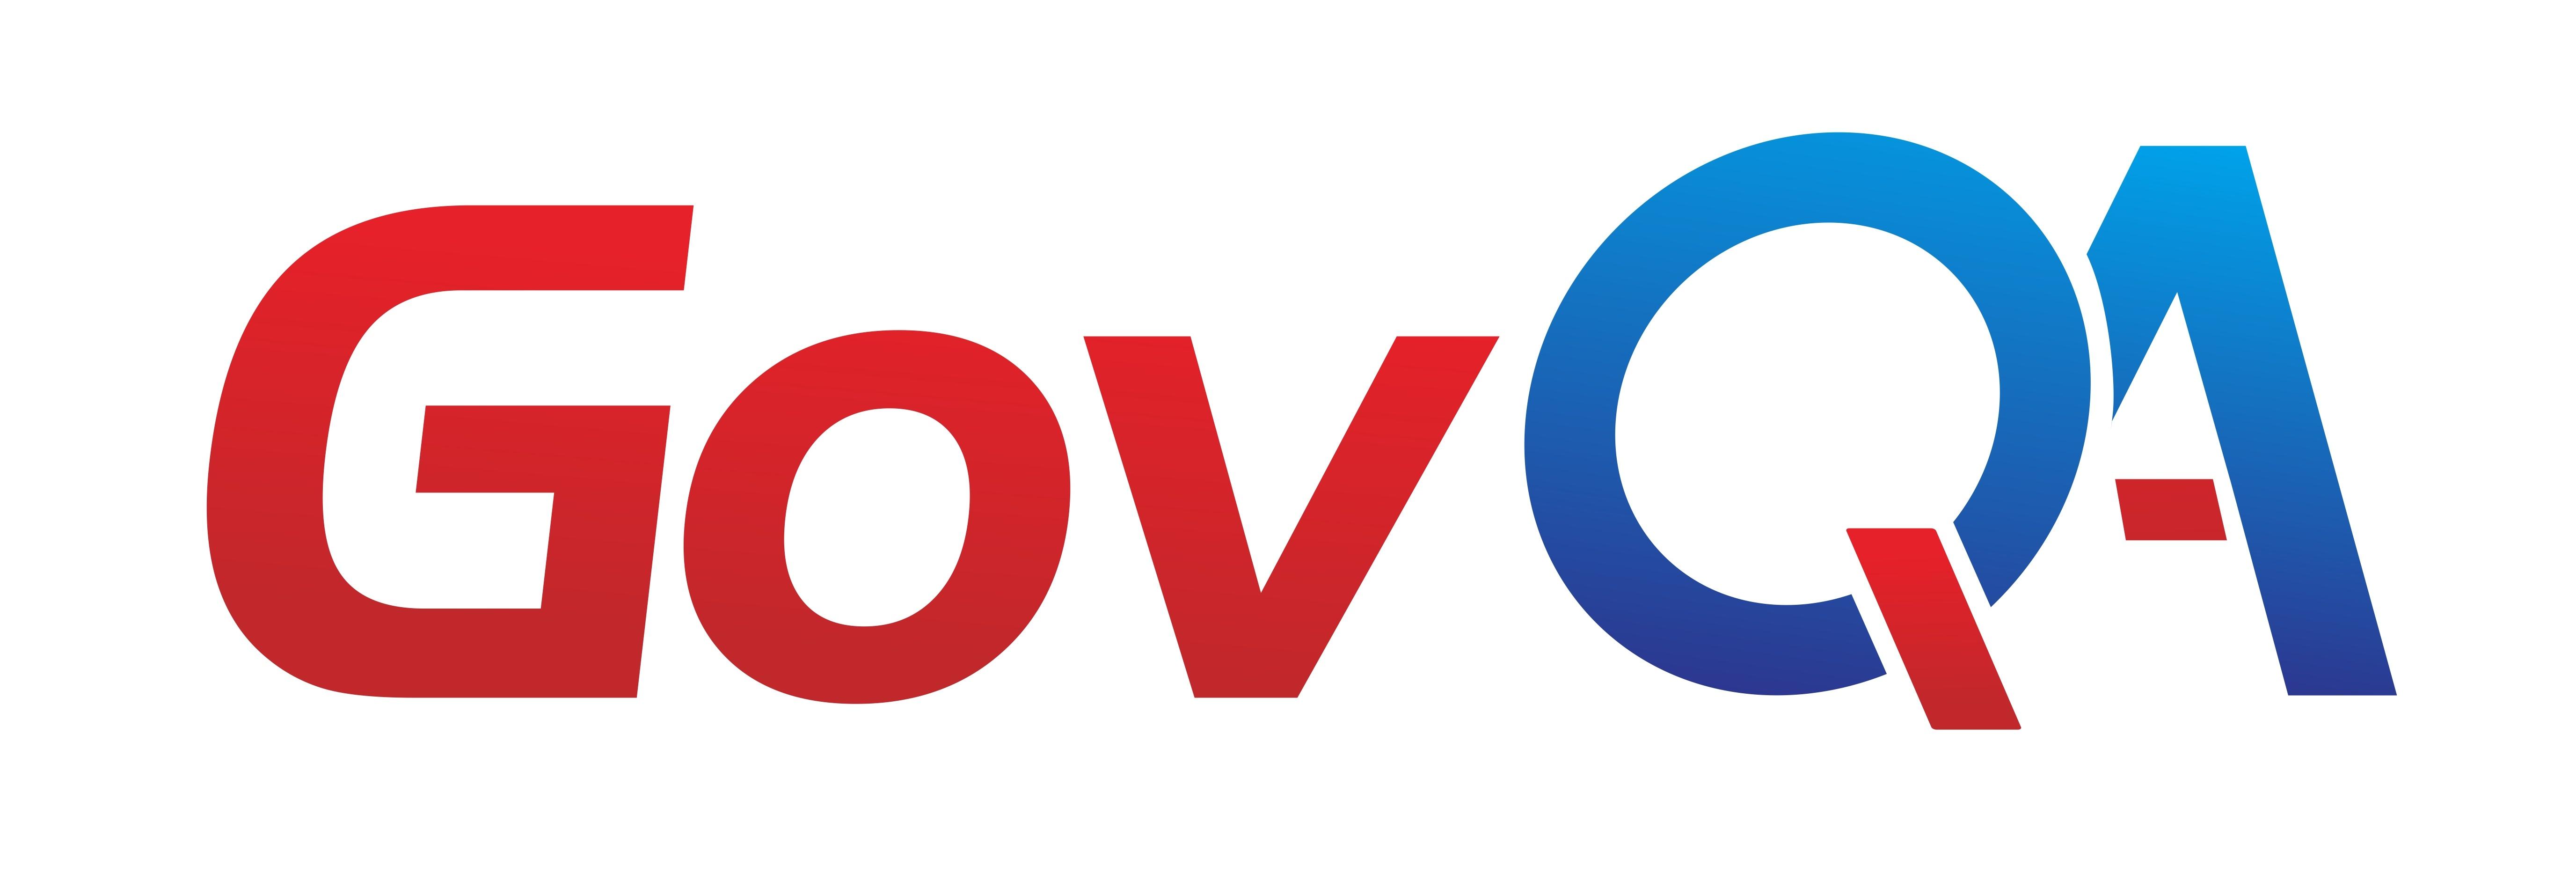 govQA-logo-2015.jpg